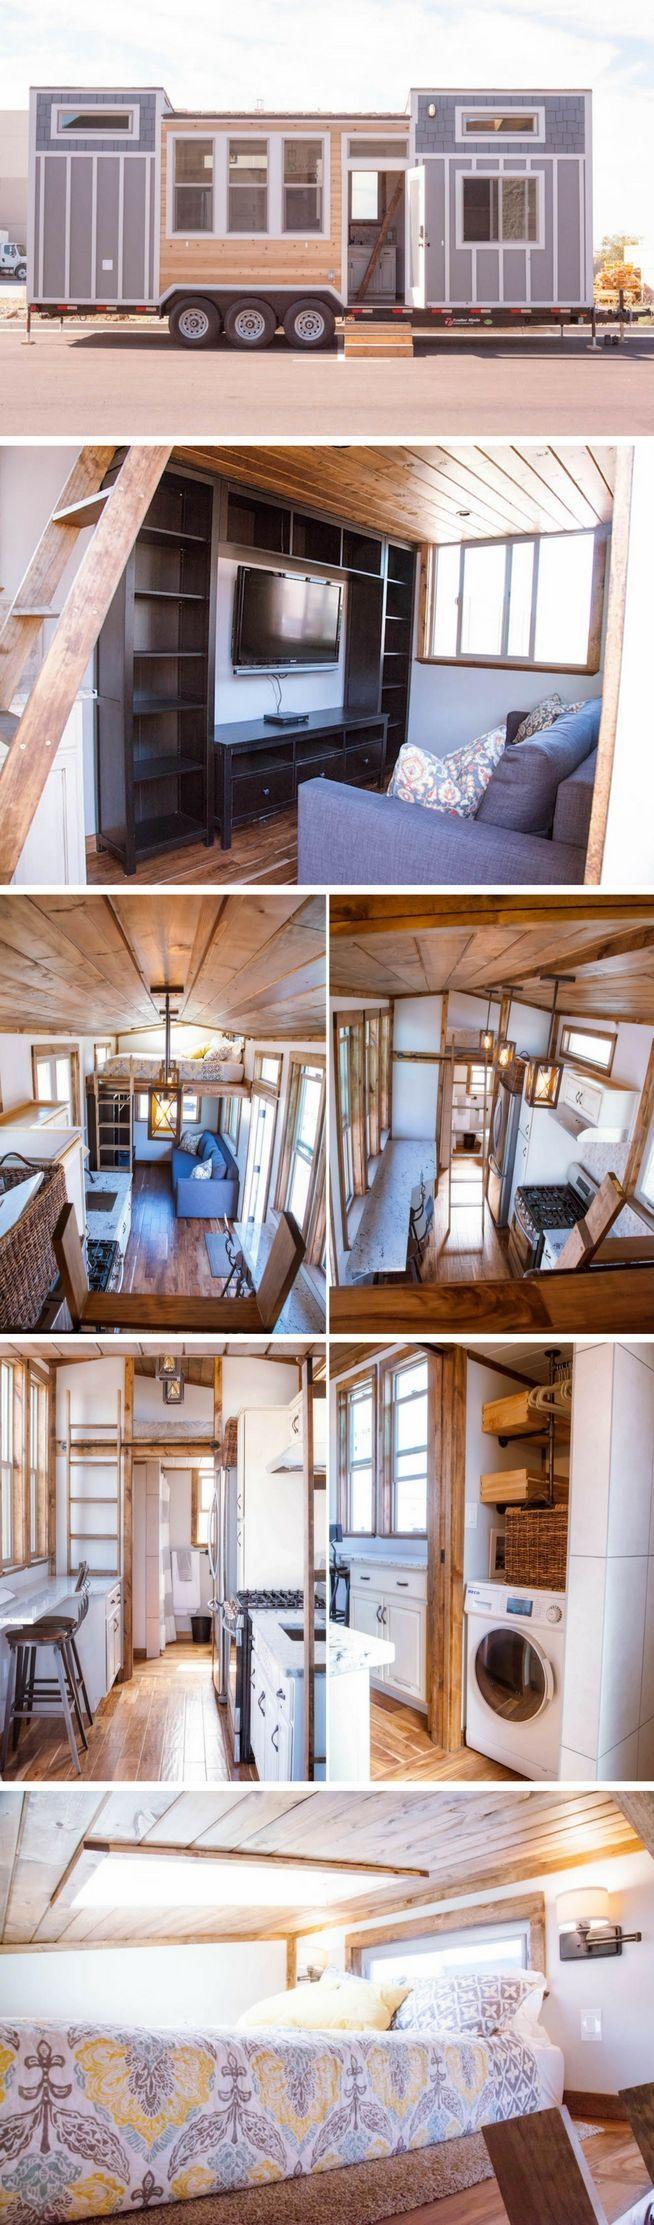 Bedroom tiny home plans on wheels furthermore romeo 500 sq ft log - The Teton Tiny House By Alpine Tiny Homes